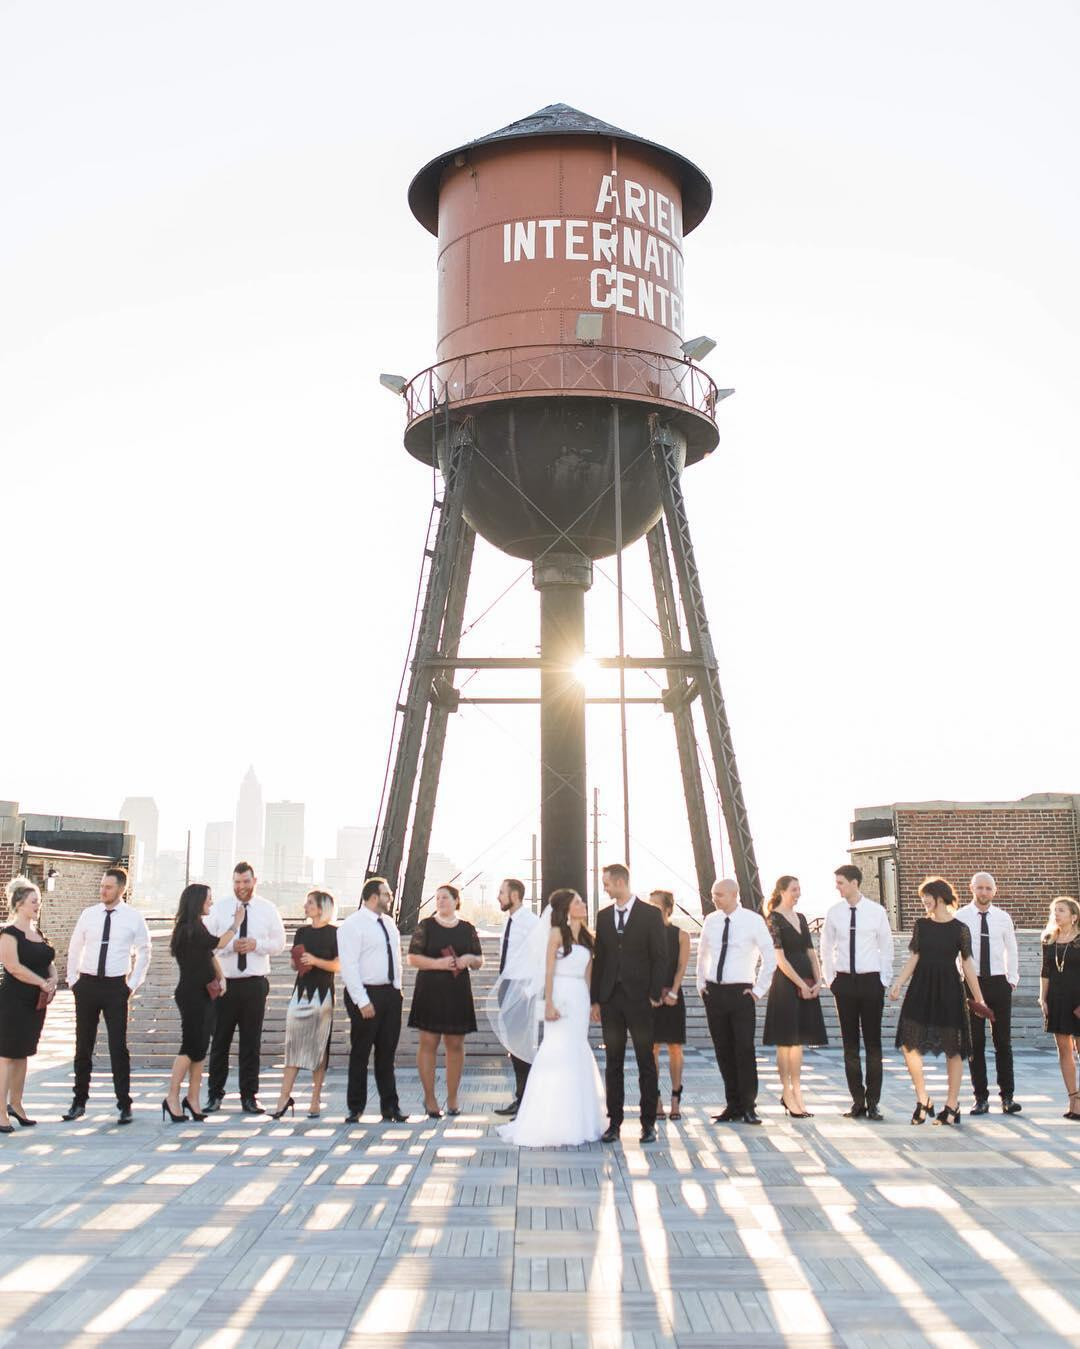 The bride & groom posing alongside the bridesmaids and groomsmen